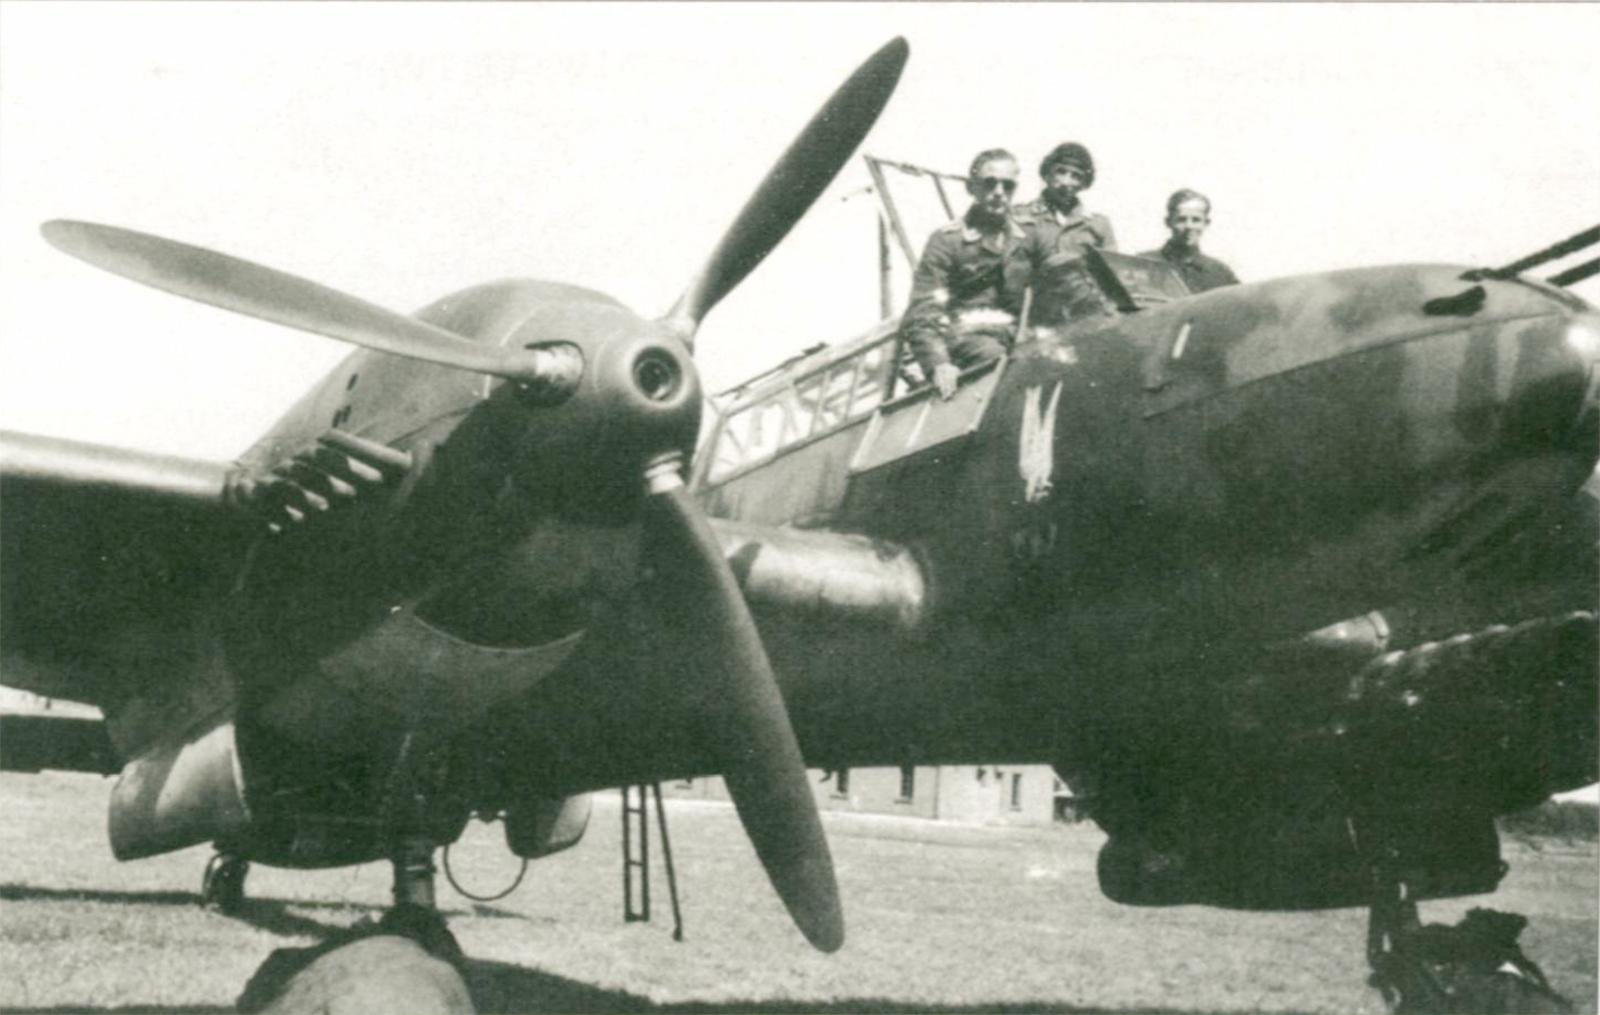 Aircrew Luftwaffe pilot NJG6 Gunther Bahr Flugzeug Clasic Special 06 P85